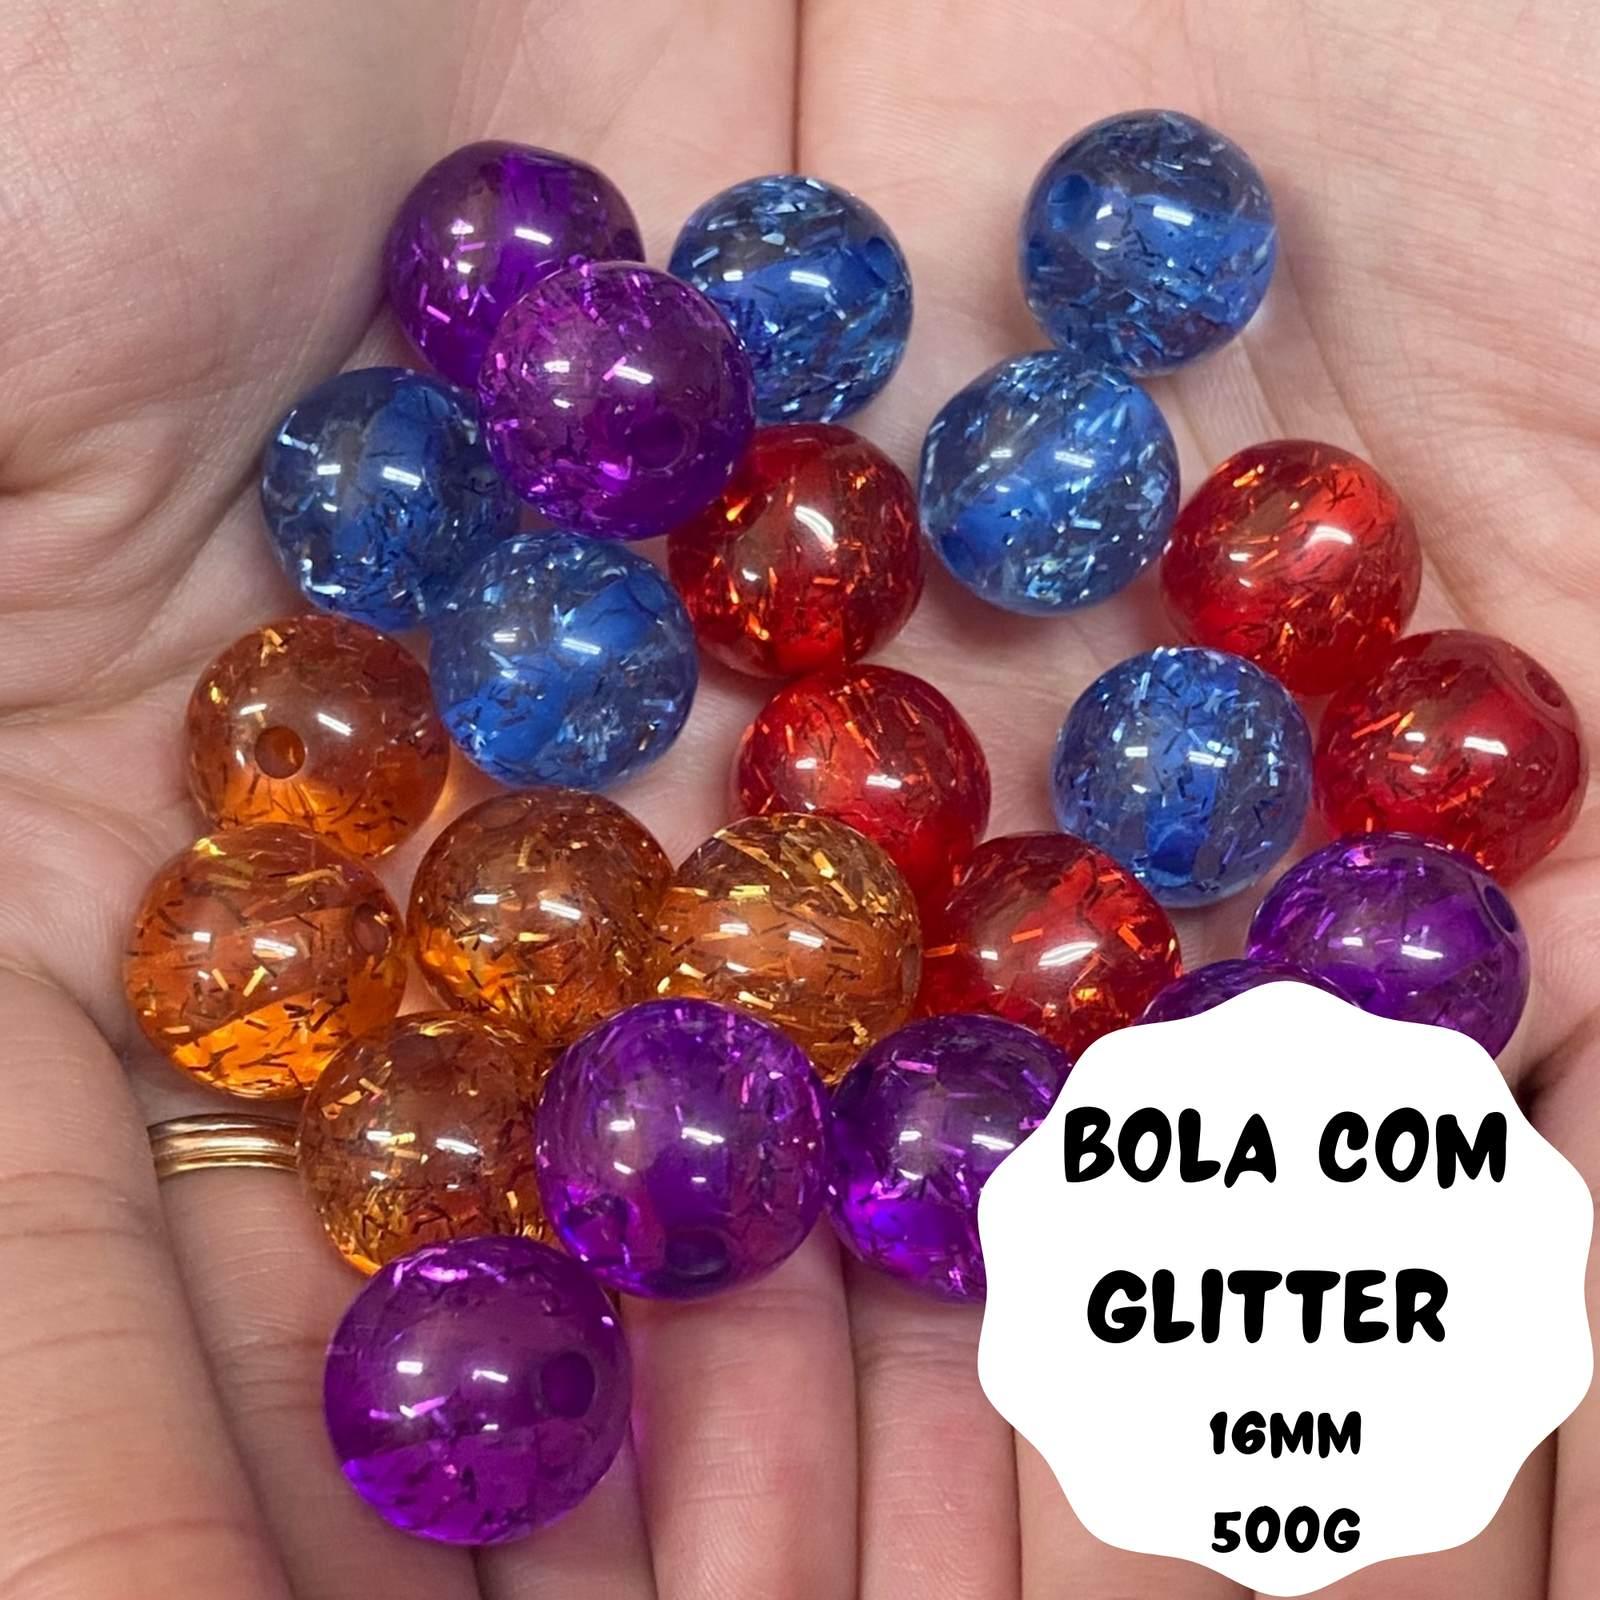 Bola Glitter 16mm - 500g